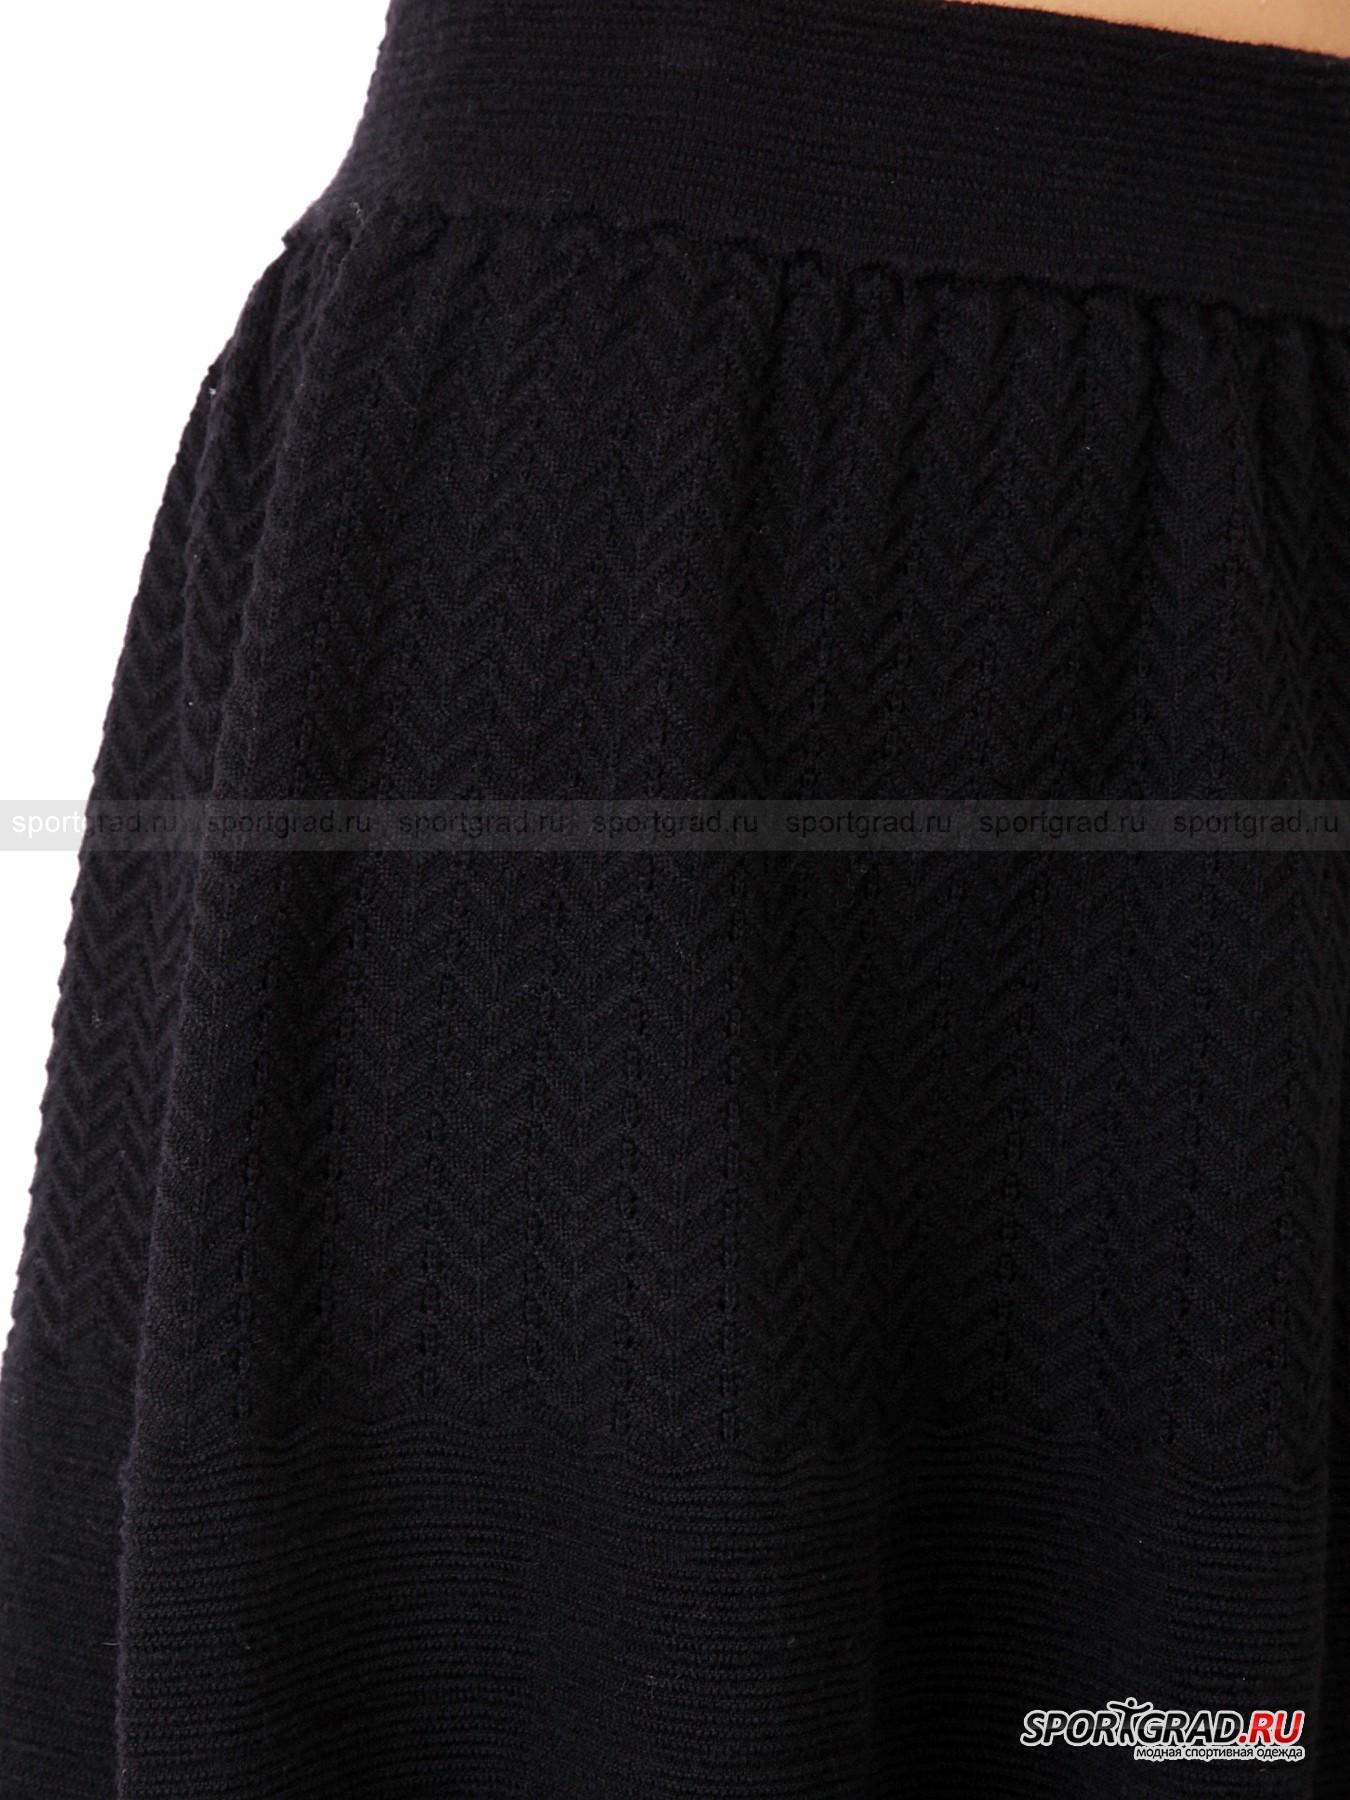 Юбка женская шерстяная MARINA YACHTING от Спортград